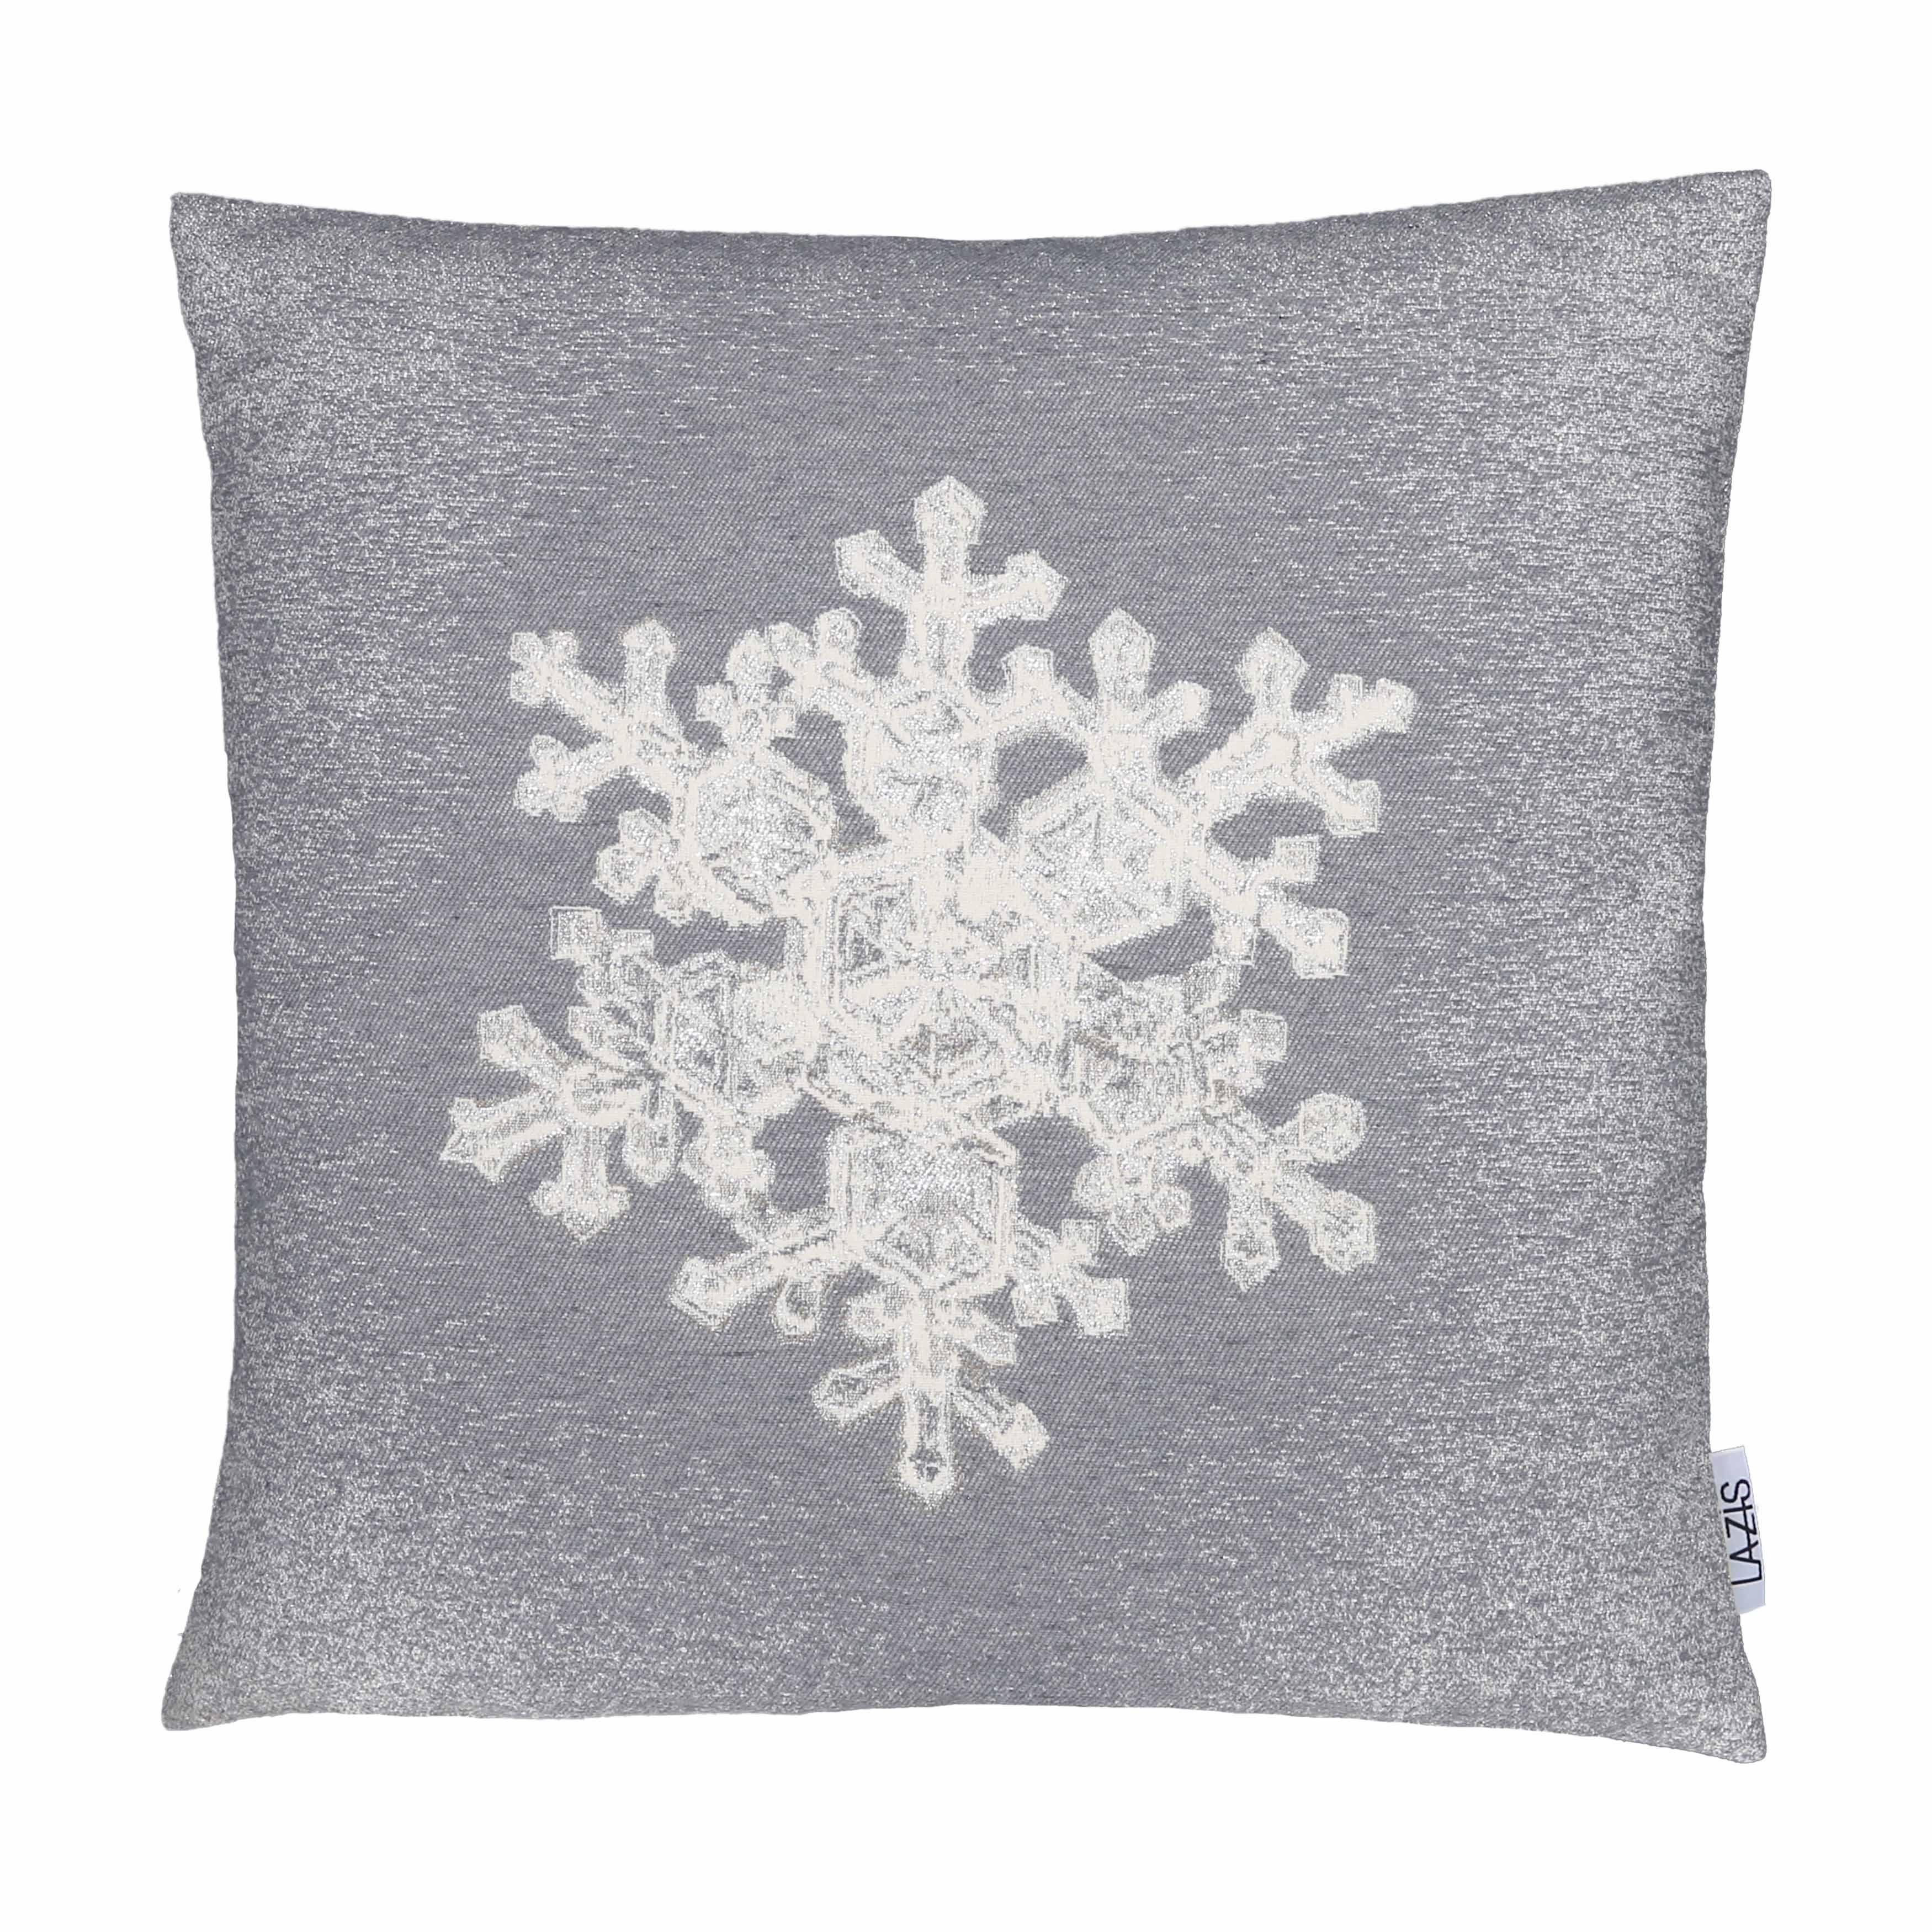 Kissenhülle EISKRISTALL silber grau Winter Weihnachten Glitzer LAZIS La Cassetta